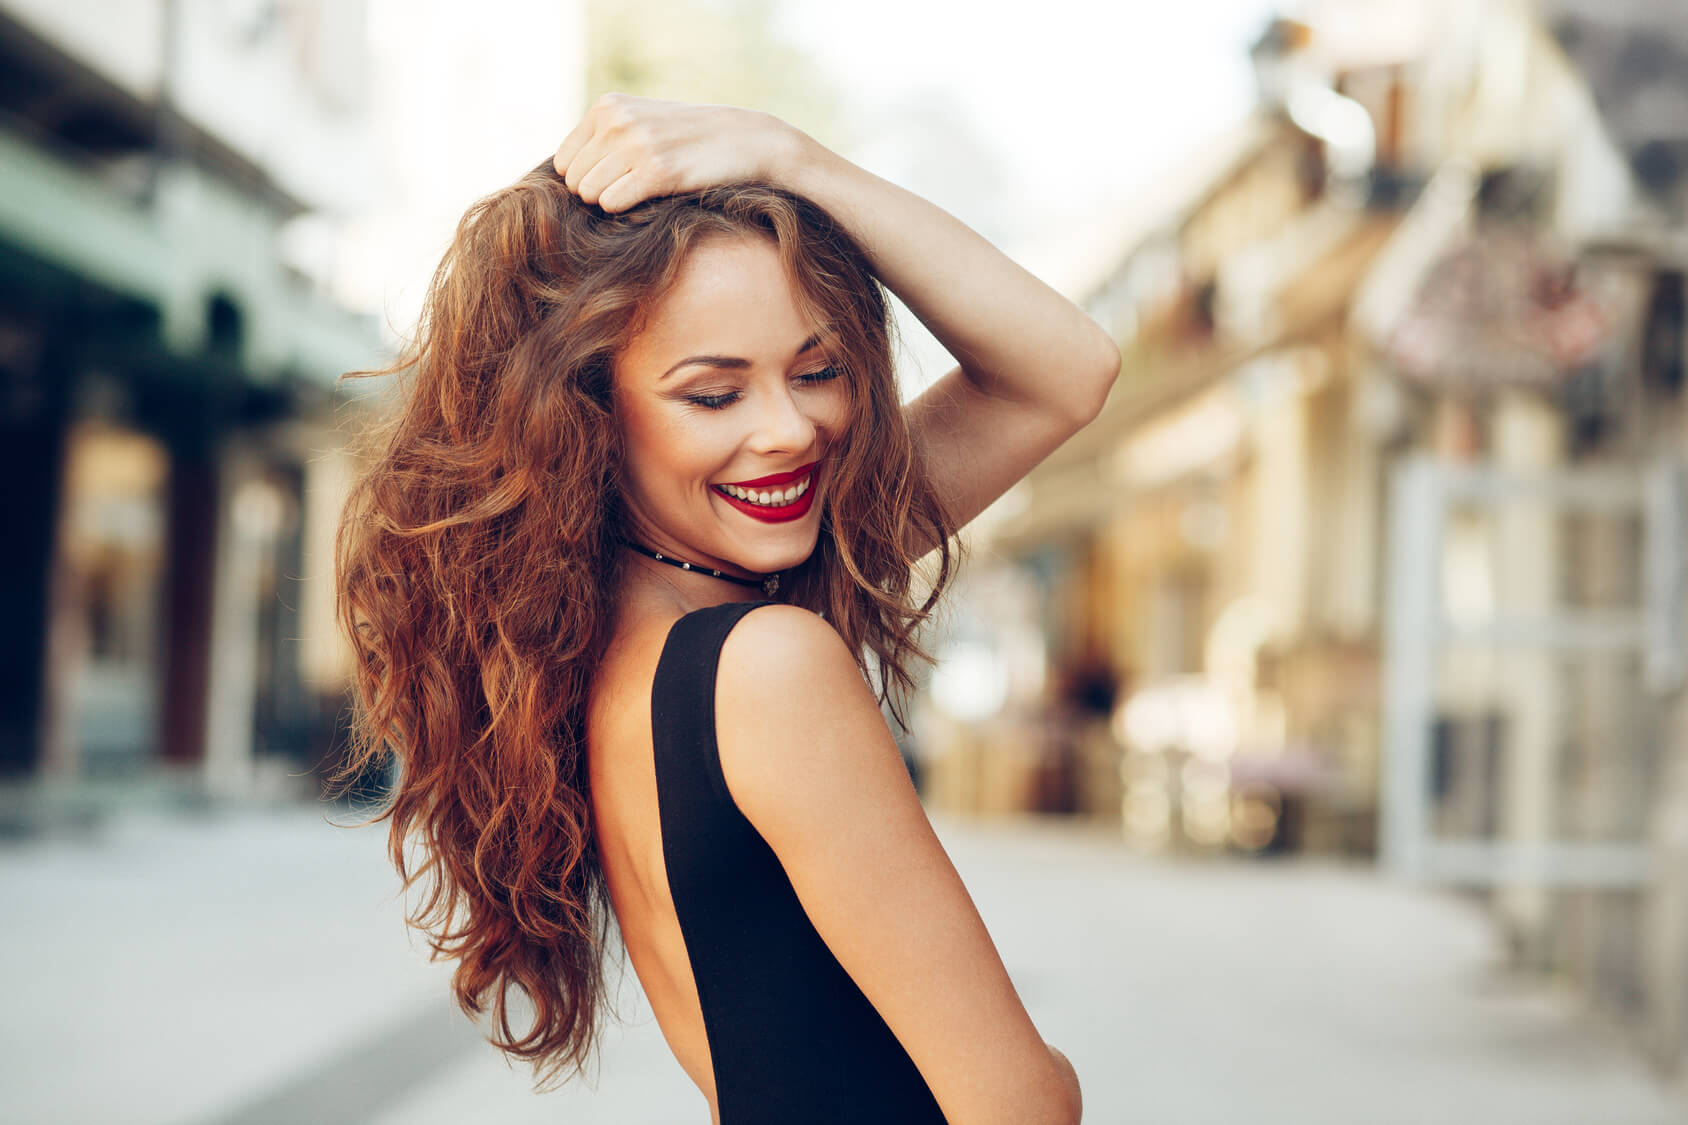 Attractive lady happy with dental veneers